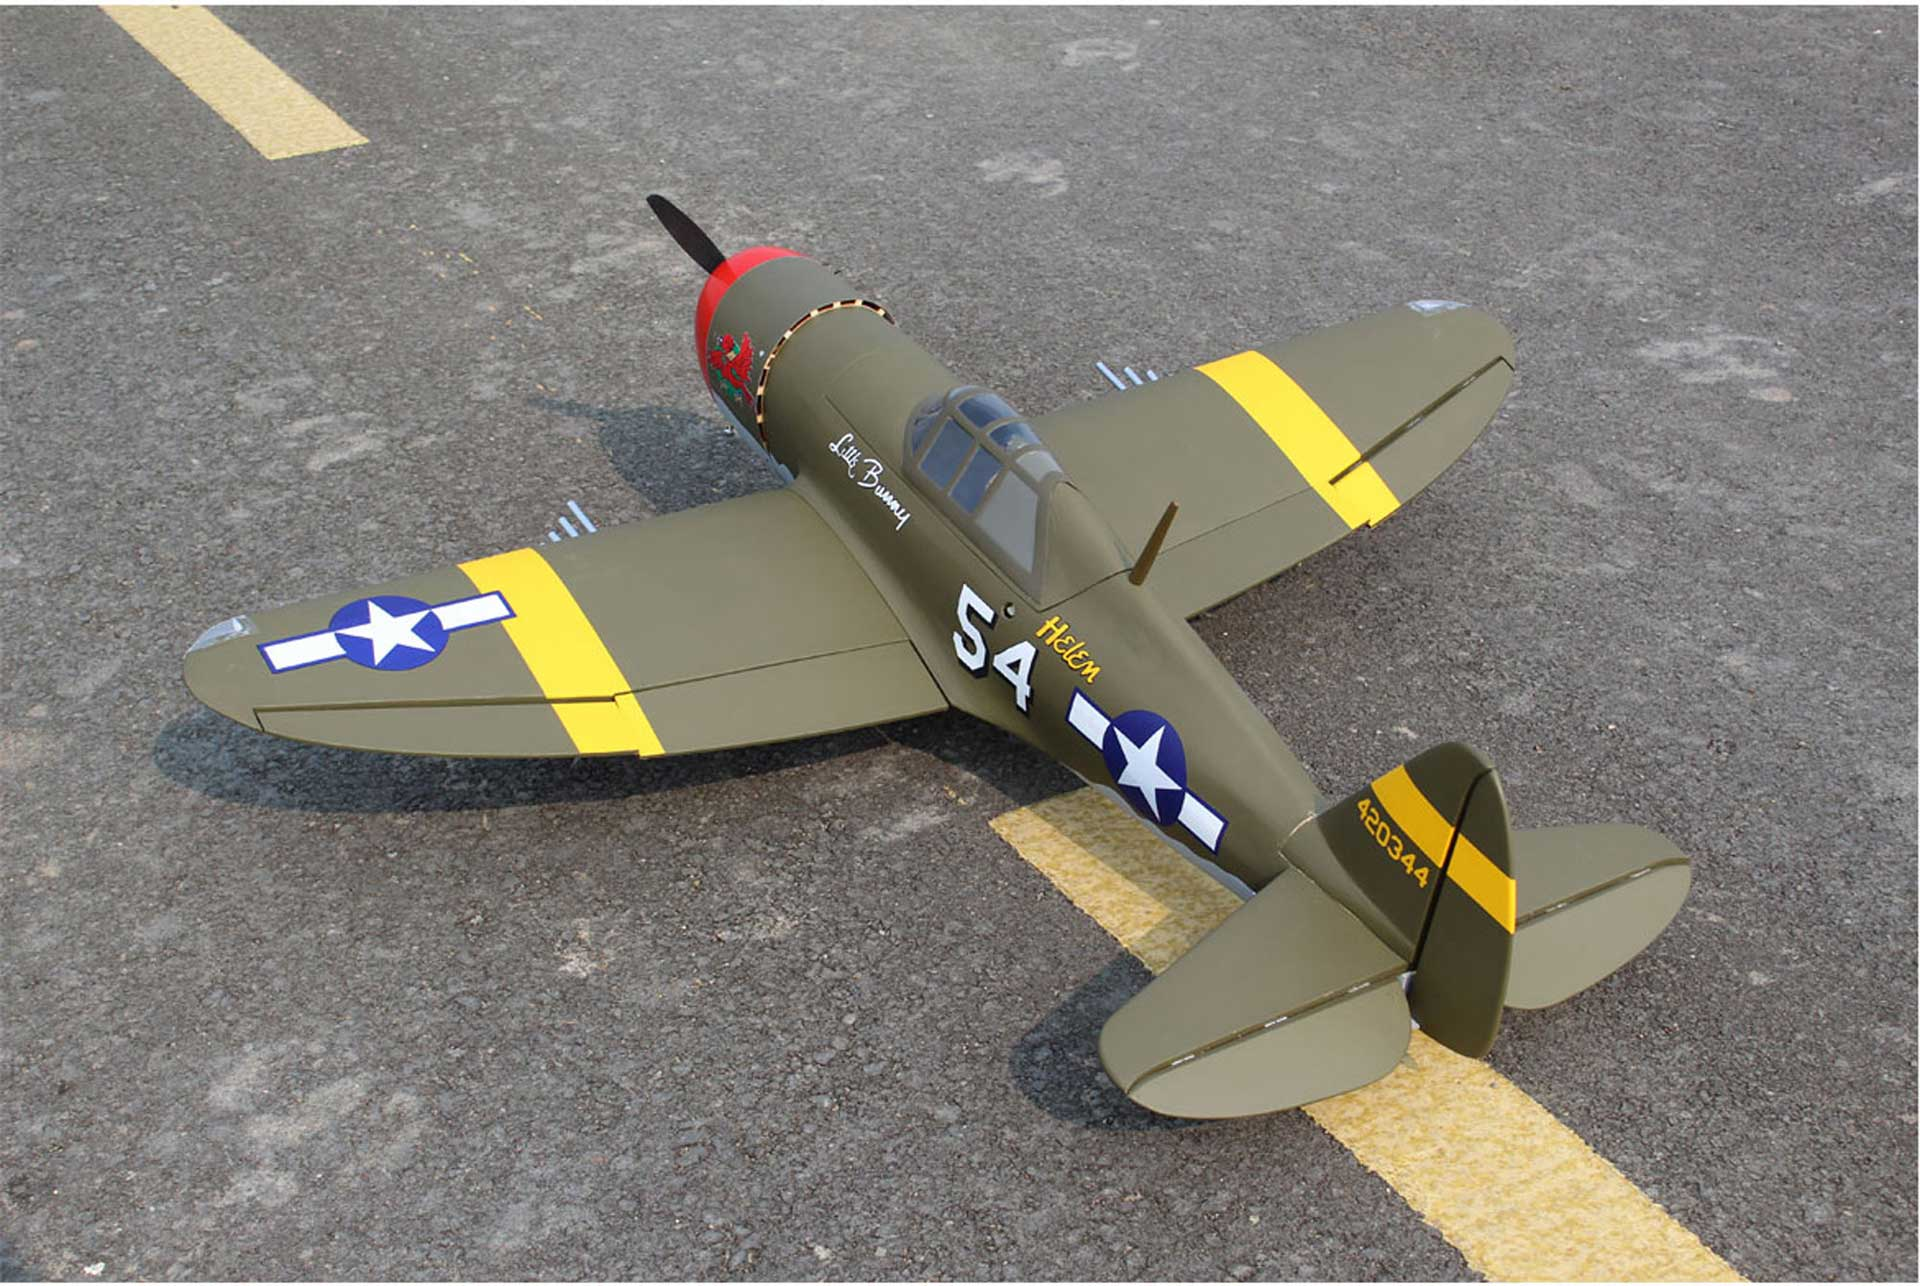 "SG-MODELS P-47D ""LITTLE BUNNY"" MK II ARF 1,4M"